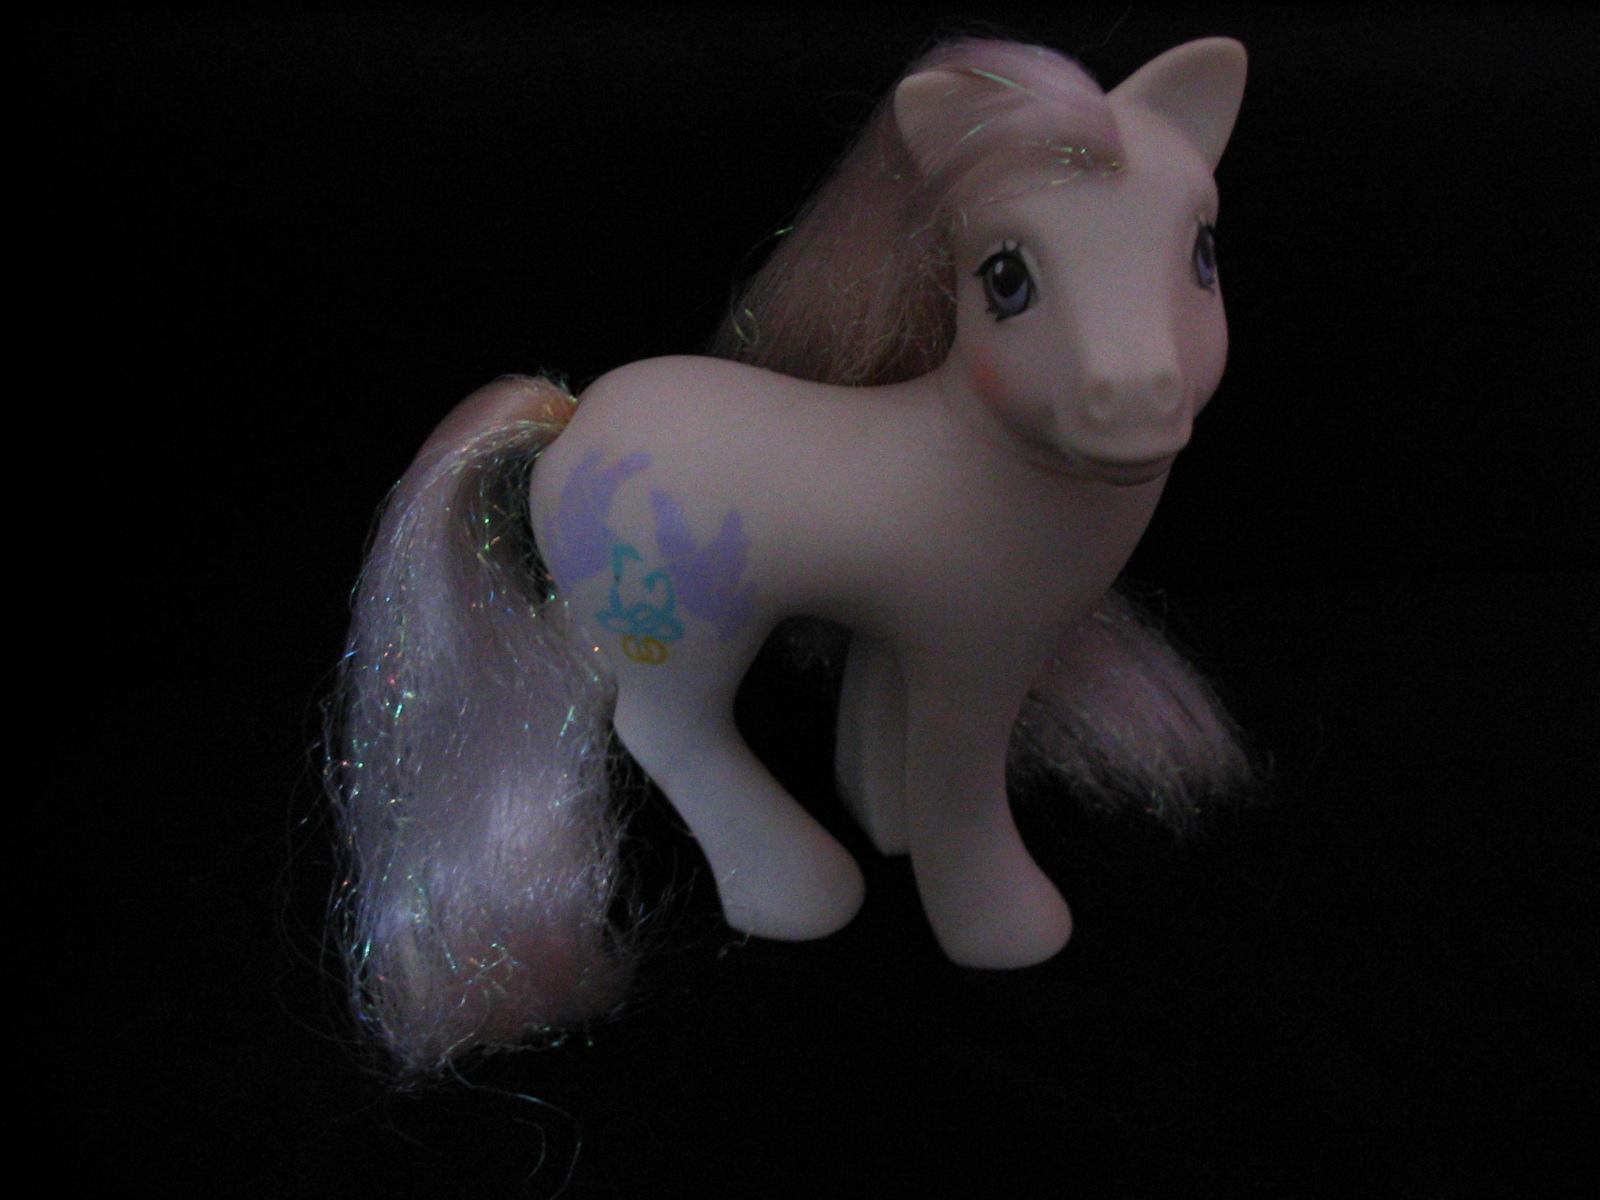 peony-stock: my little pony 1 by peony-stock